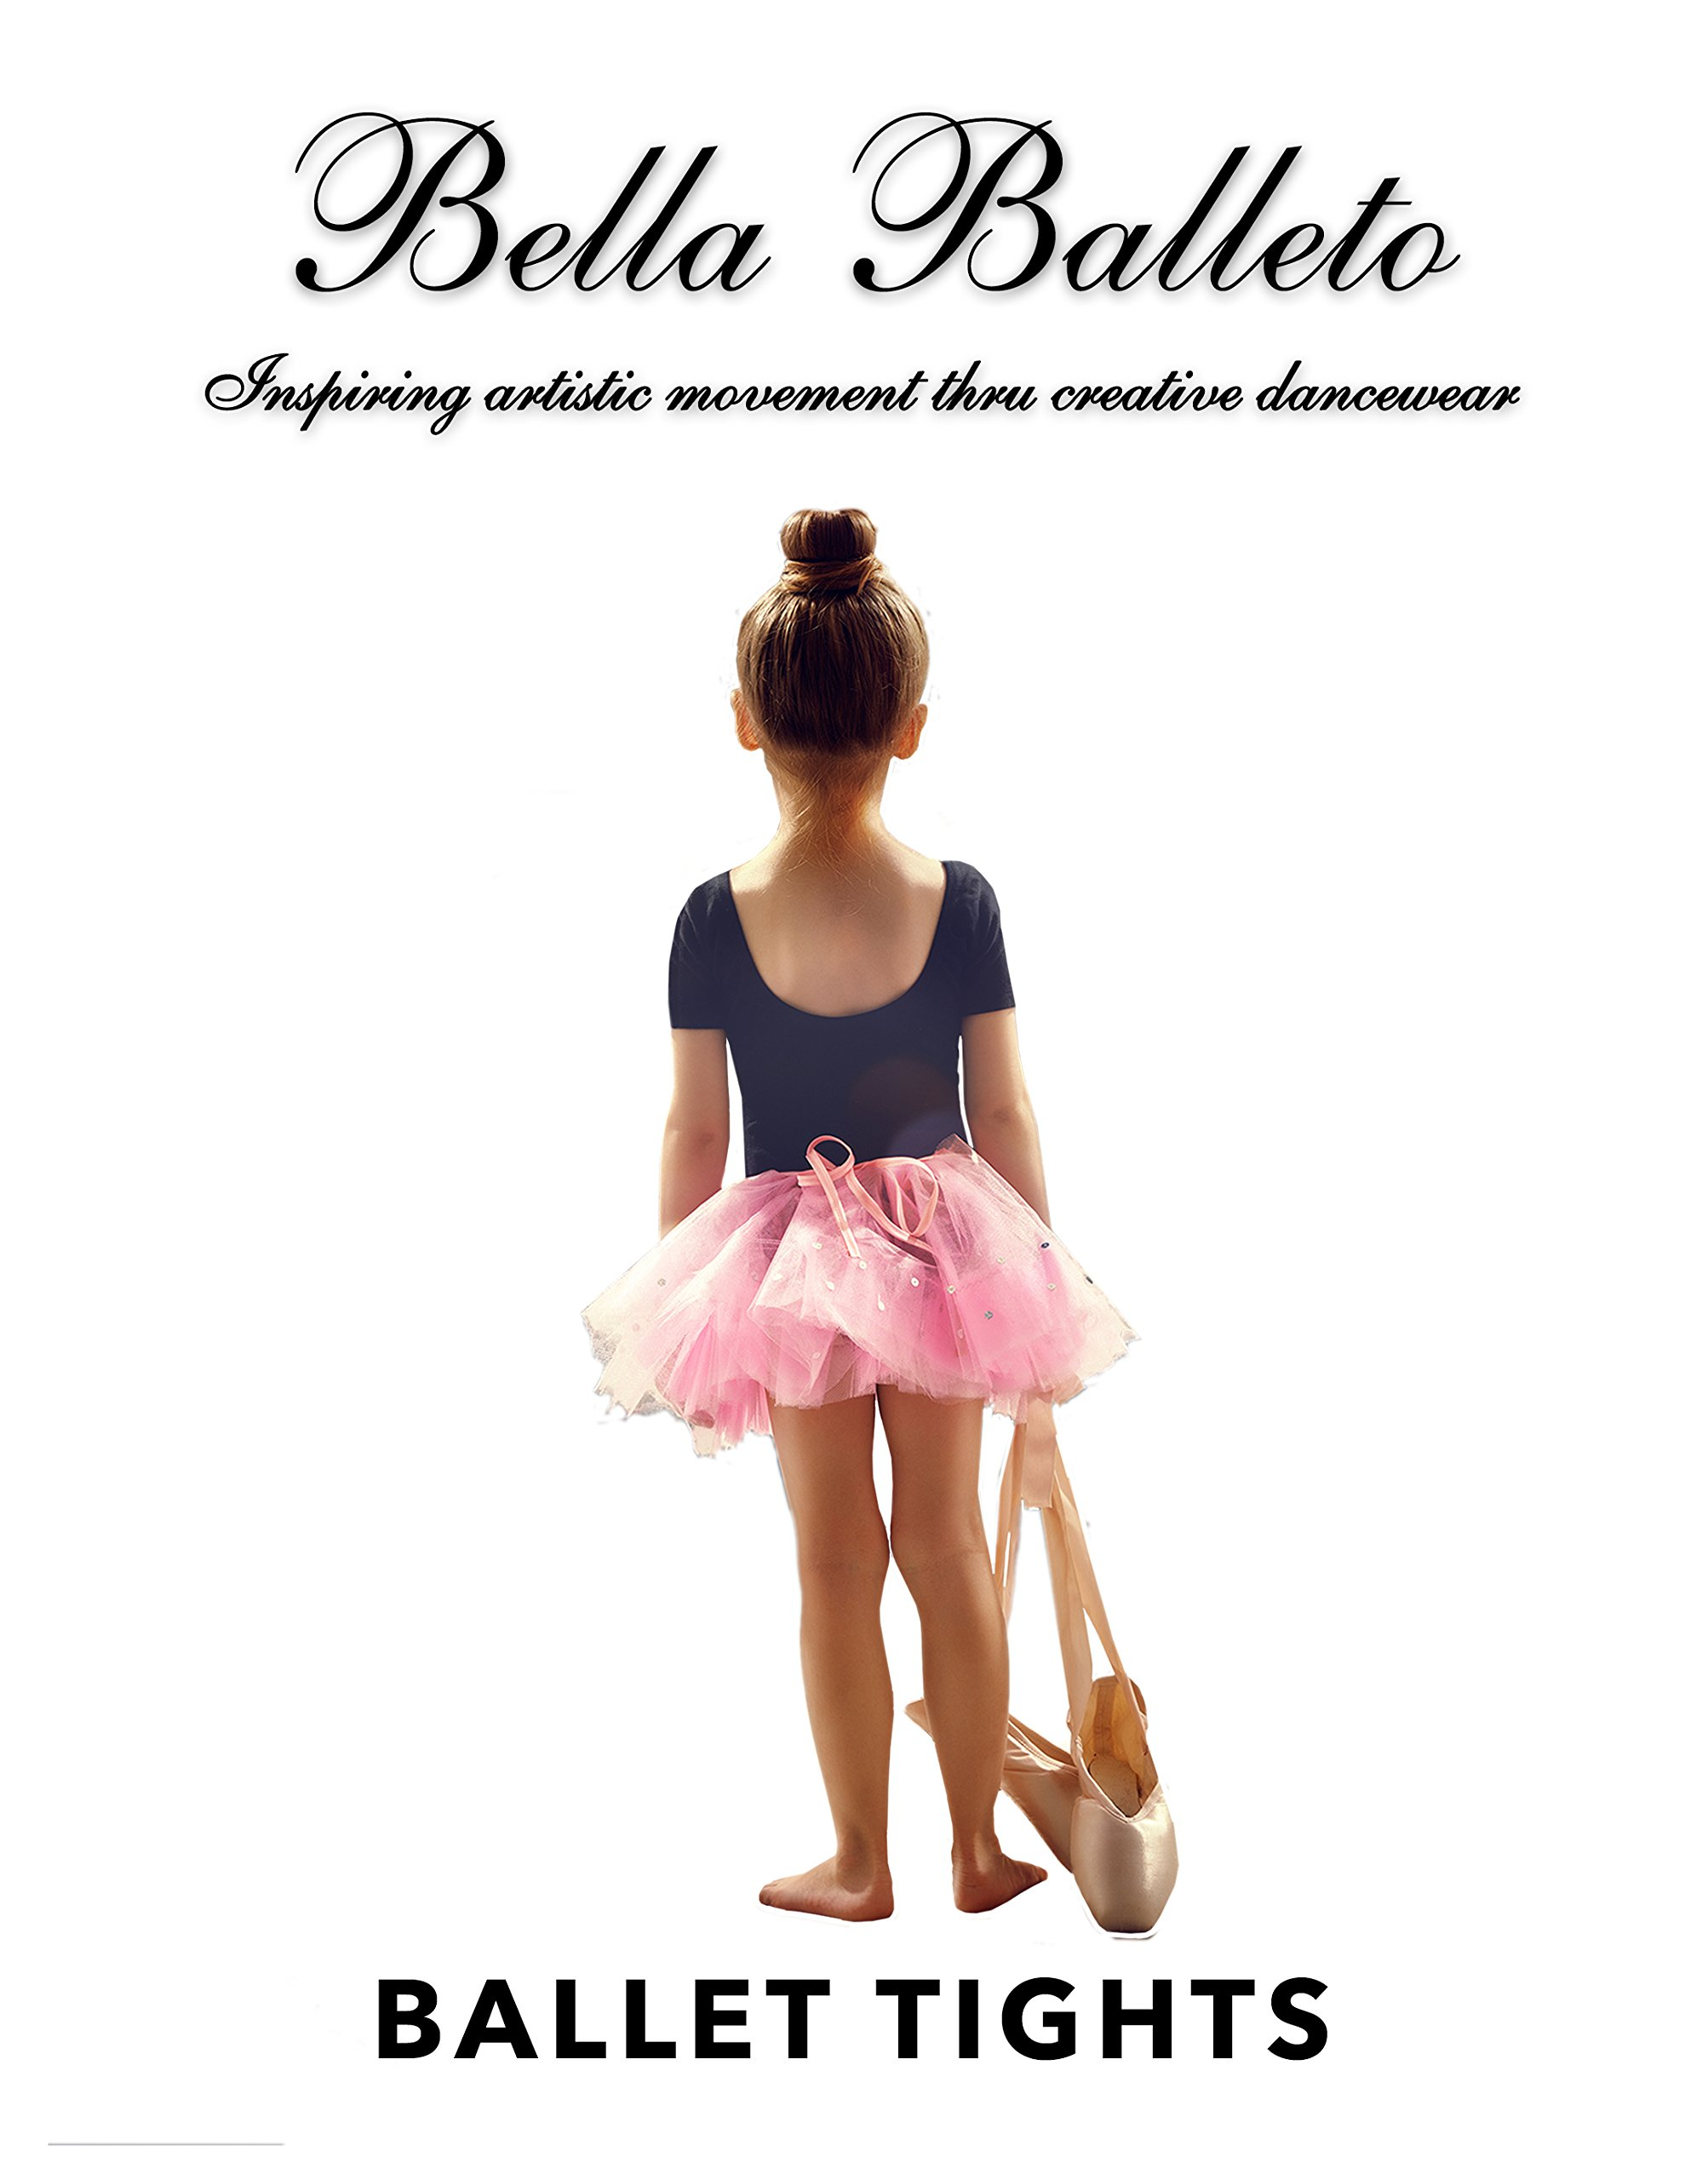 BELLA BALLETO BALLET TIGHT LT SUNTAN CONVERTIBLE ADULT MEDIUM by BELLA BALLETO LT SUNTAN BALLET CONVERTIBLE TIGHT ADULT MEDIUM HAND SEWN FLAT INVISIBLE SEAMS